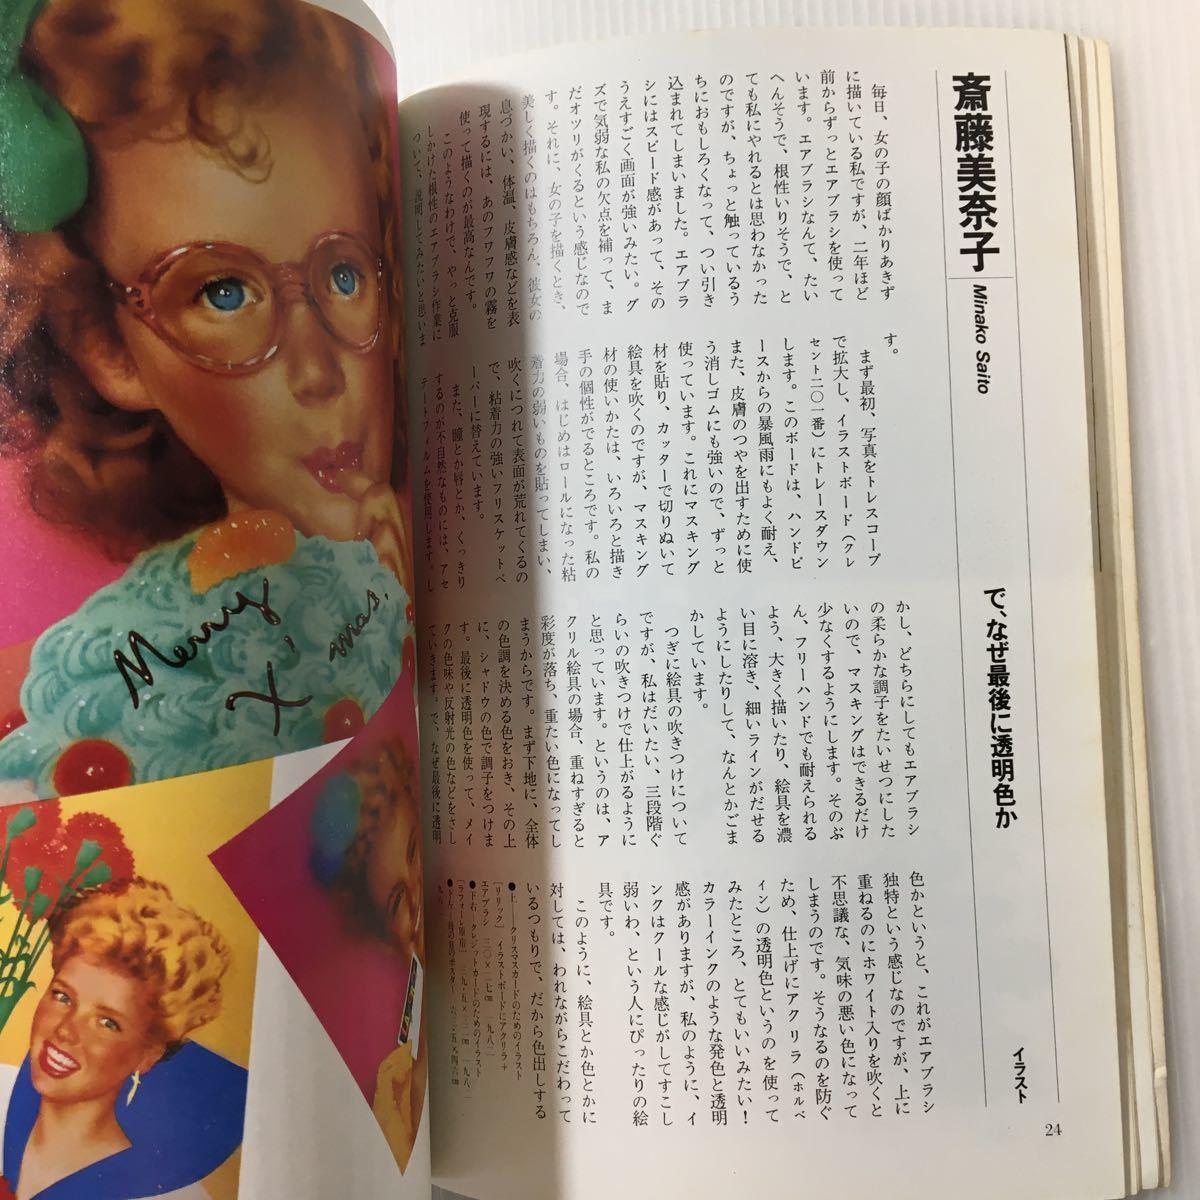 zaa-050♪別冊 美術手帖 デザインの現場から BT美術手帖 1983年3月号 Vol.2 No.4 spring_画像7